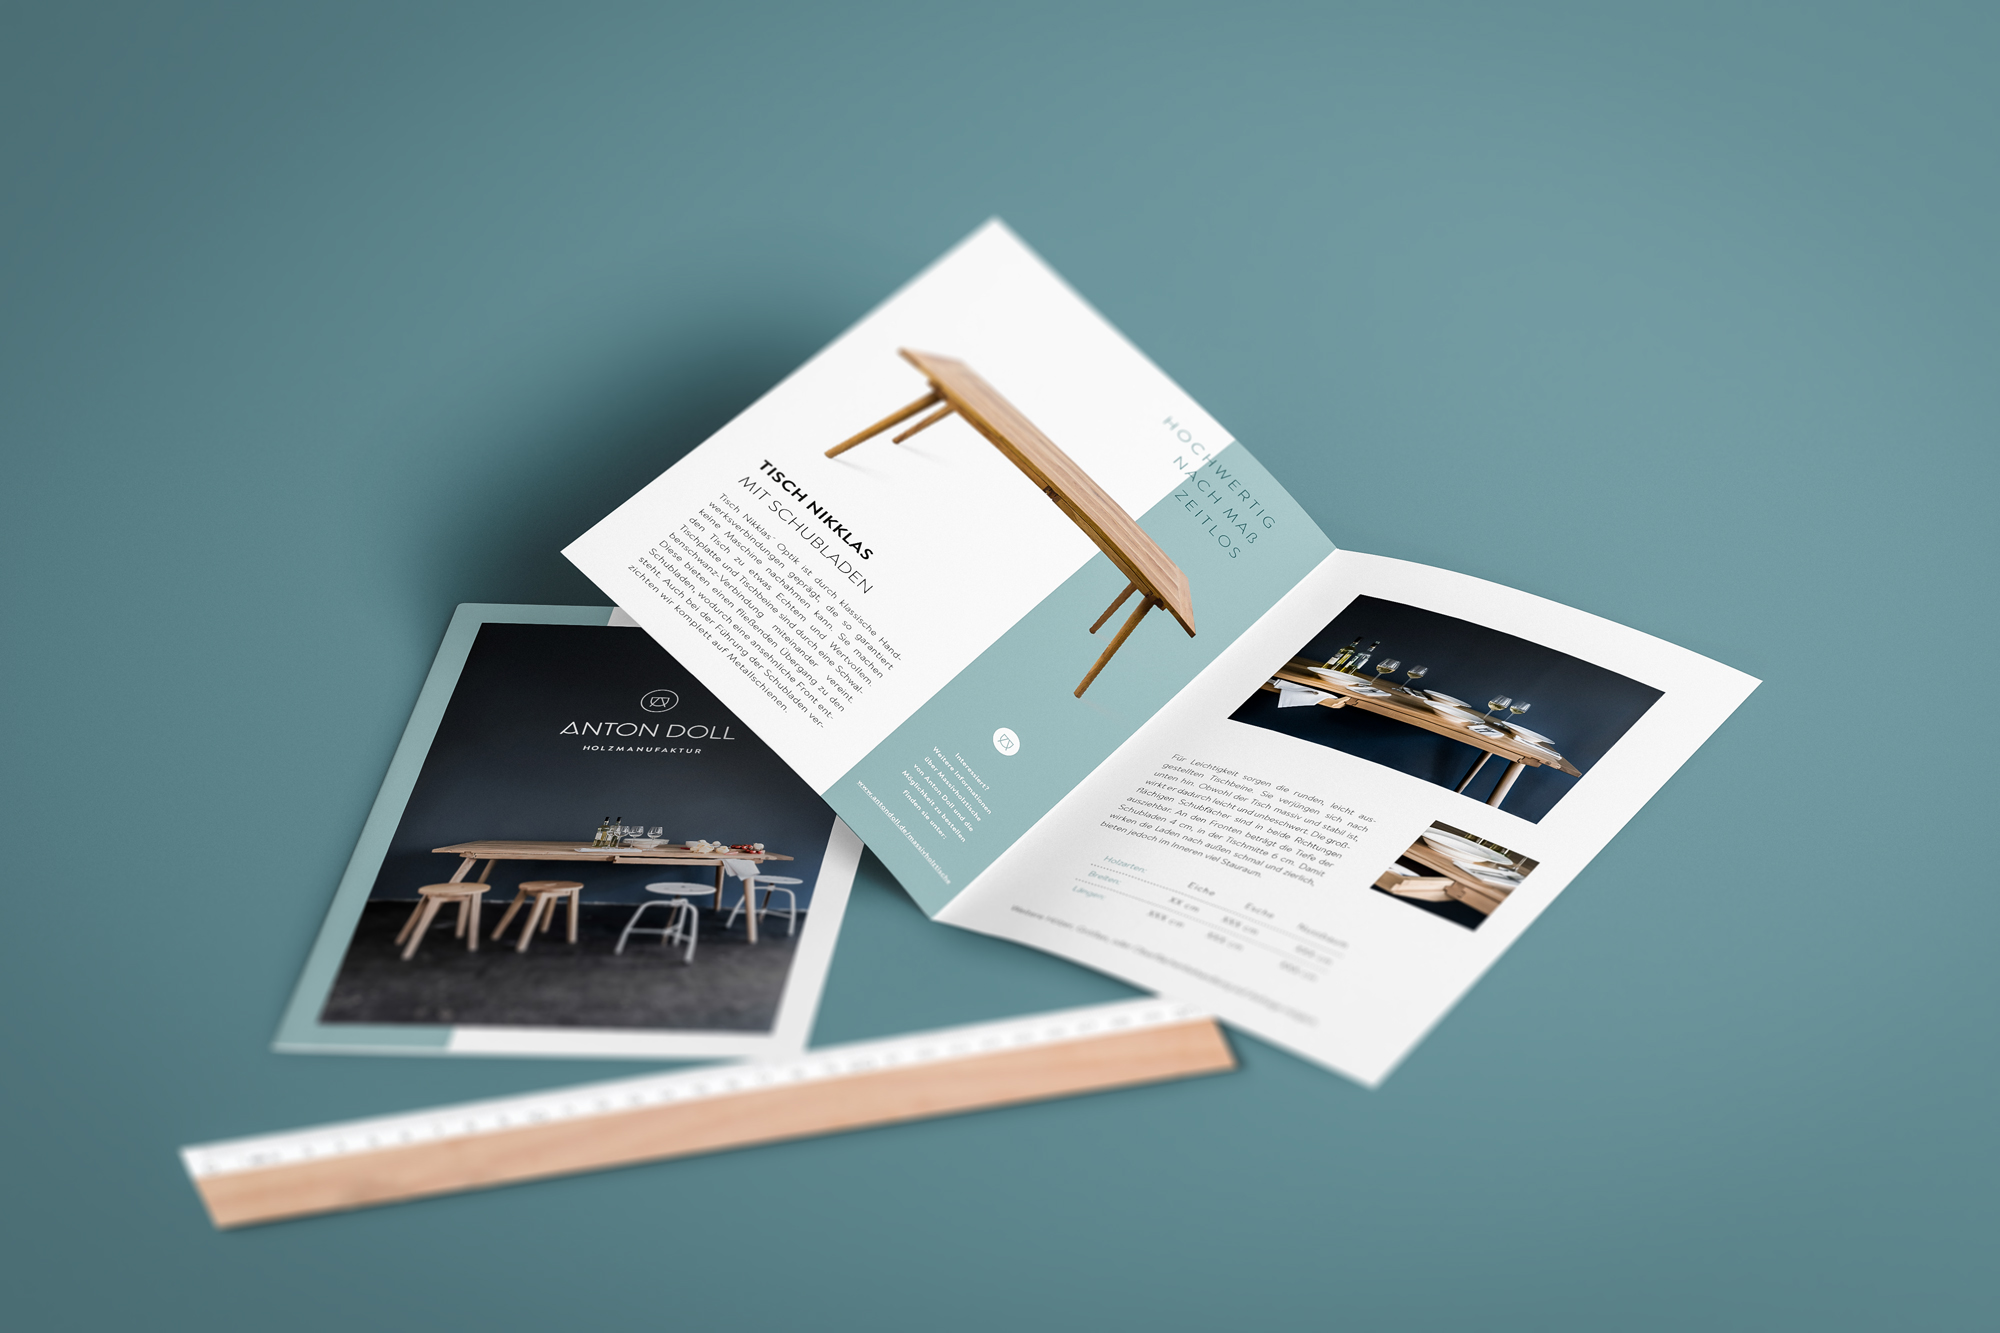 Anton_Doll_Prospekt-Michael_Seidl_Design.jpg